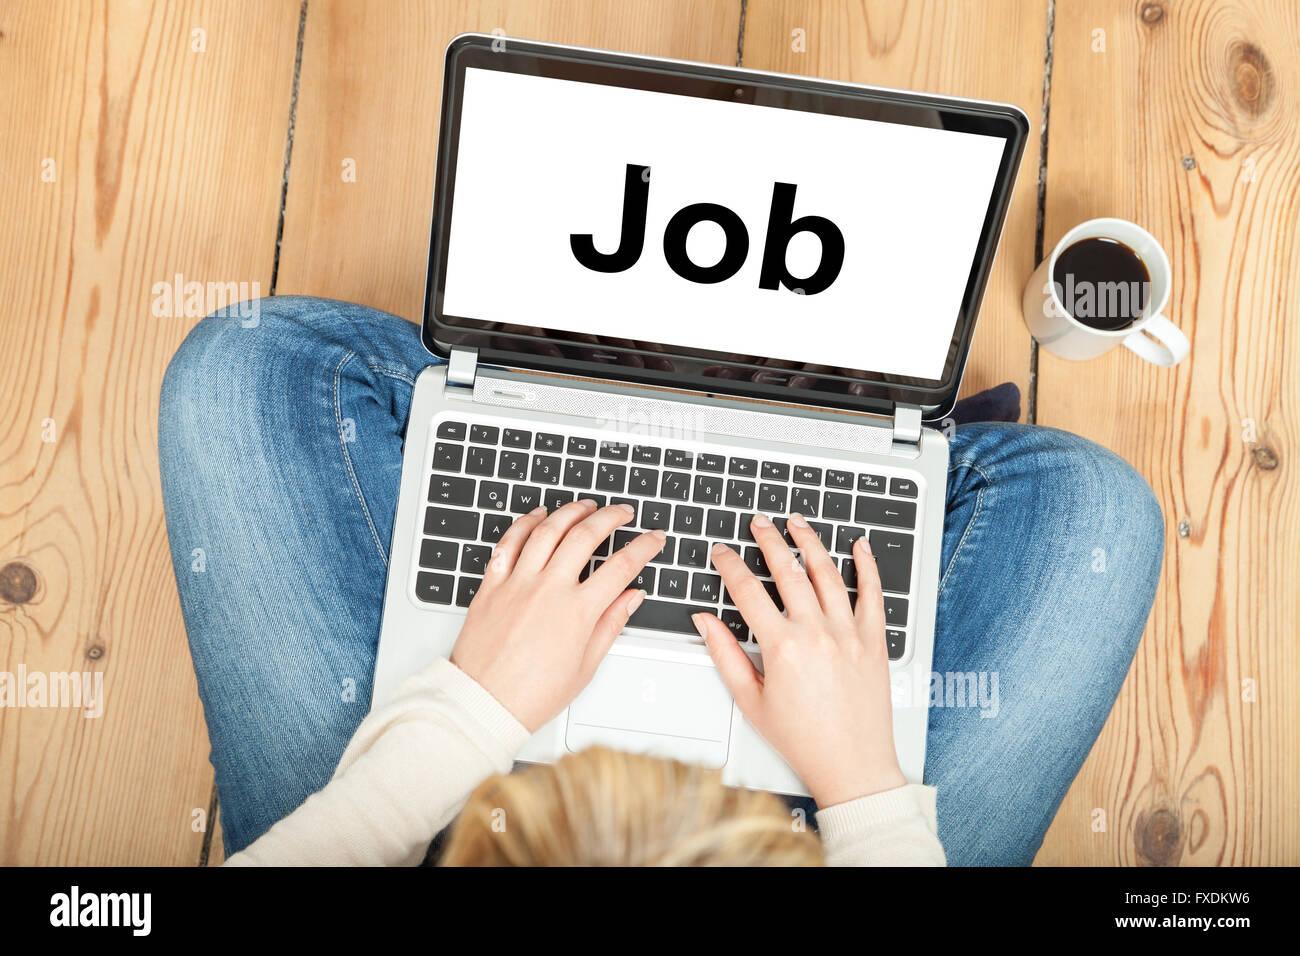 Job - Stock Image